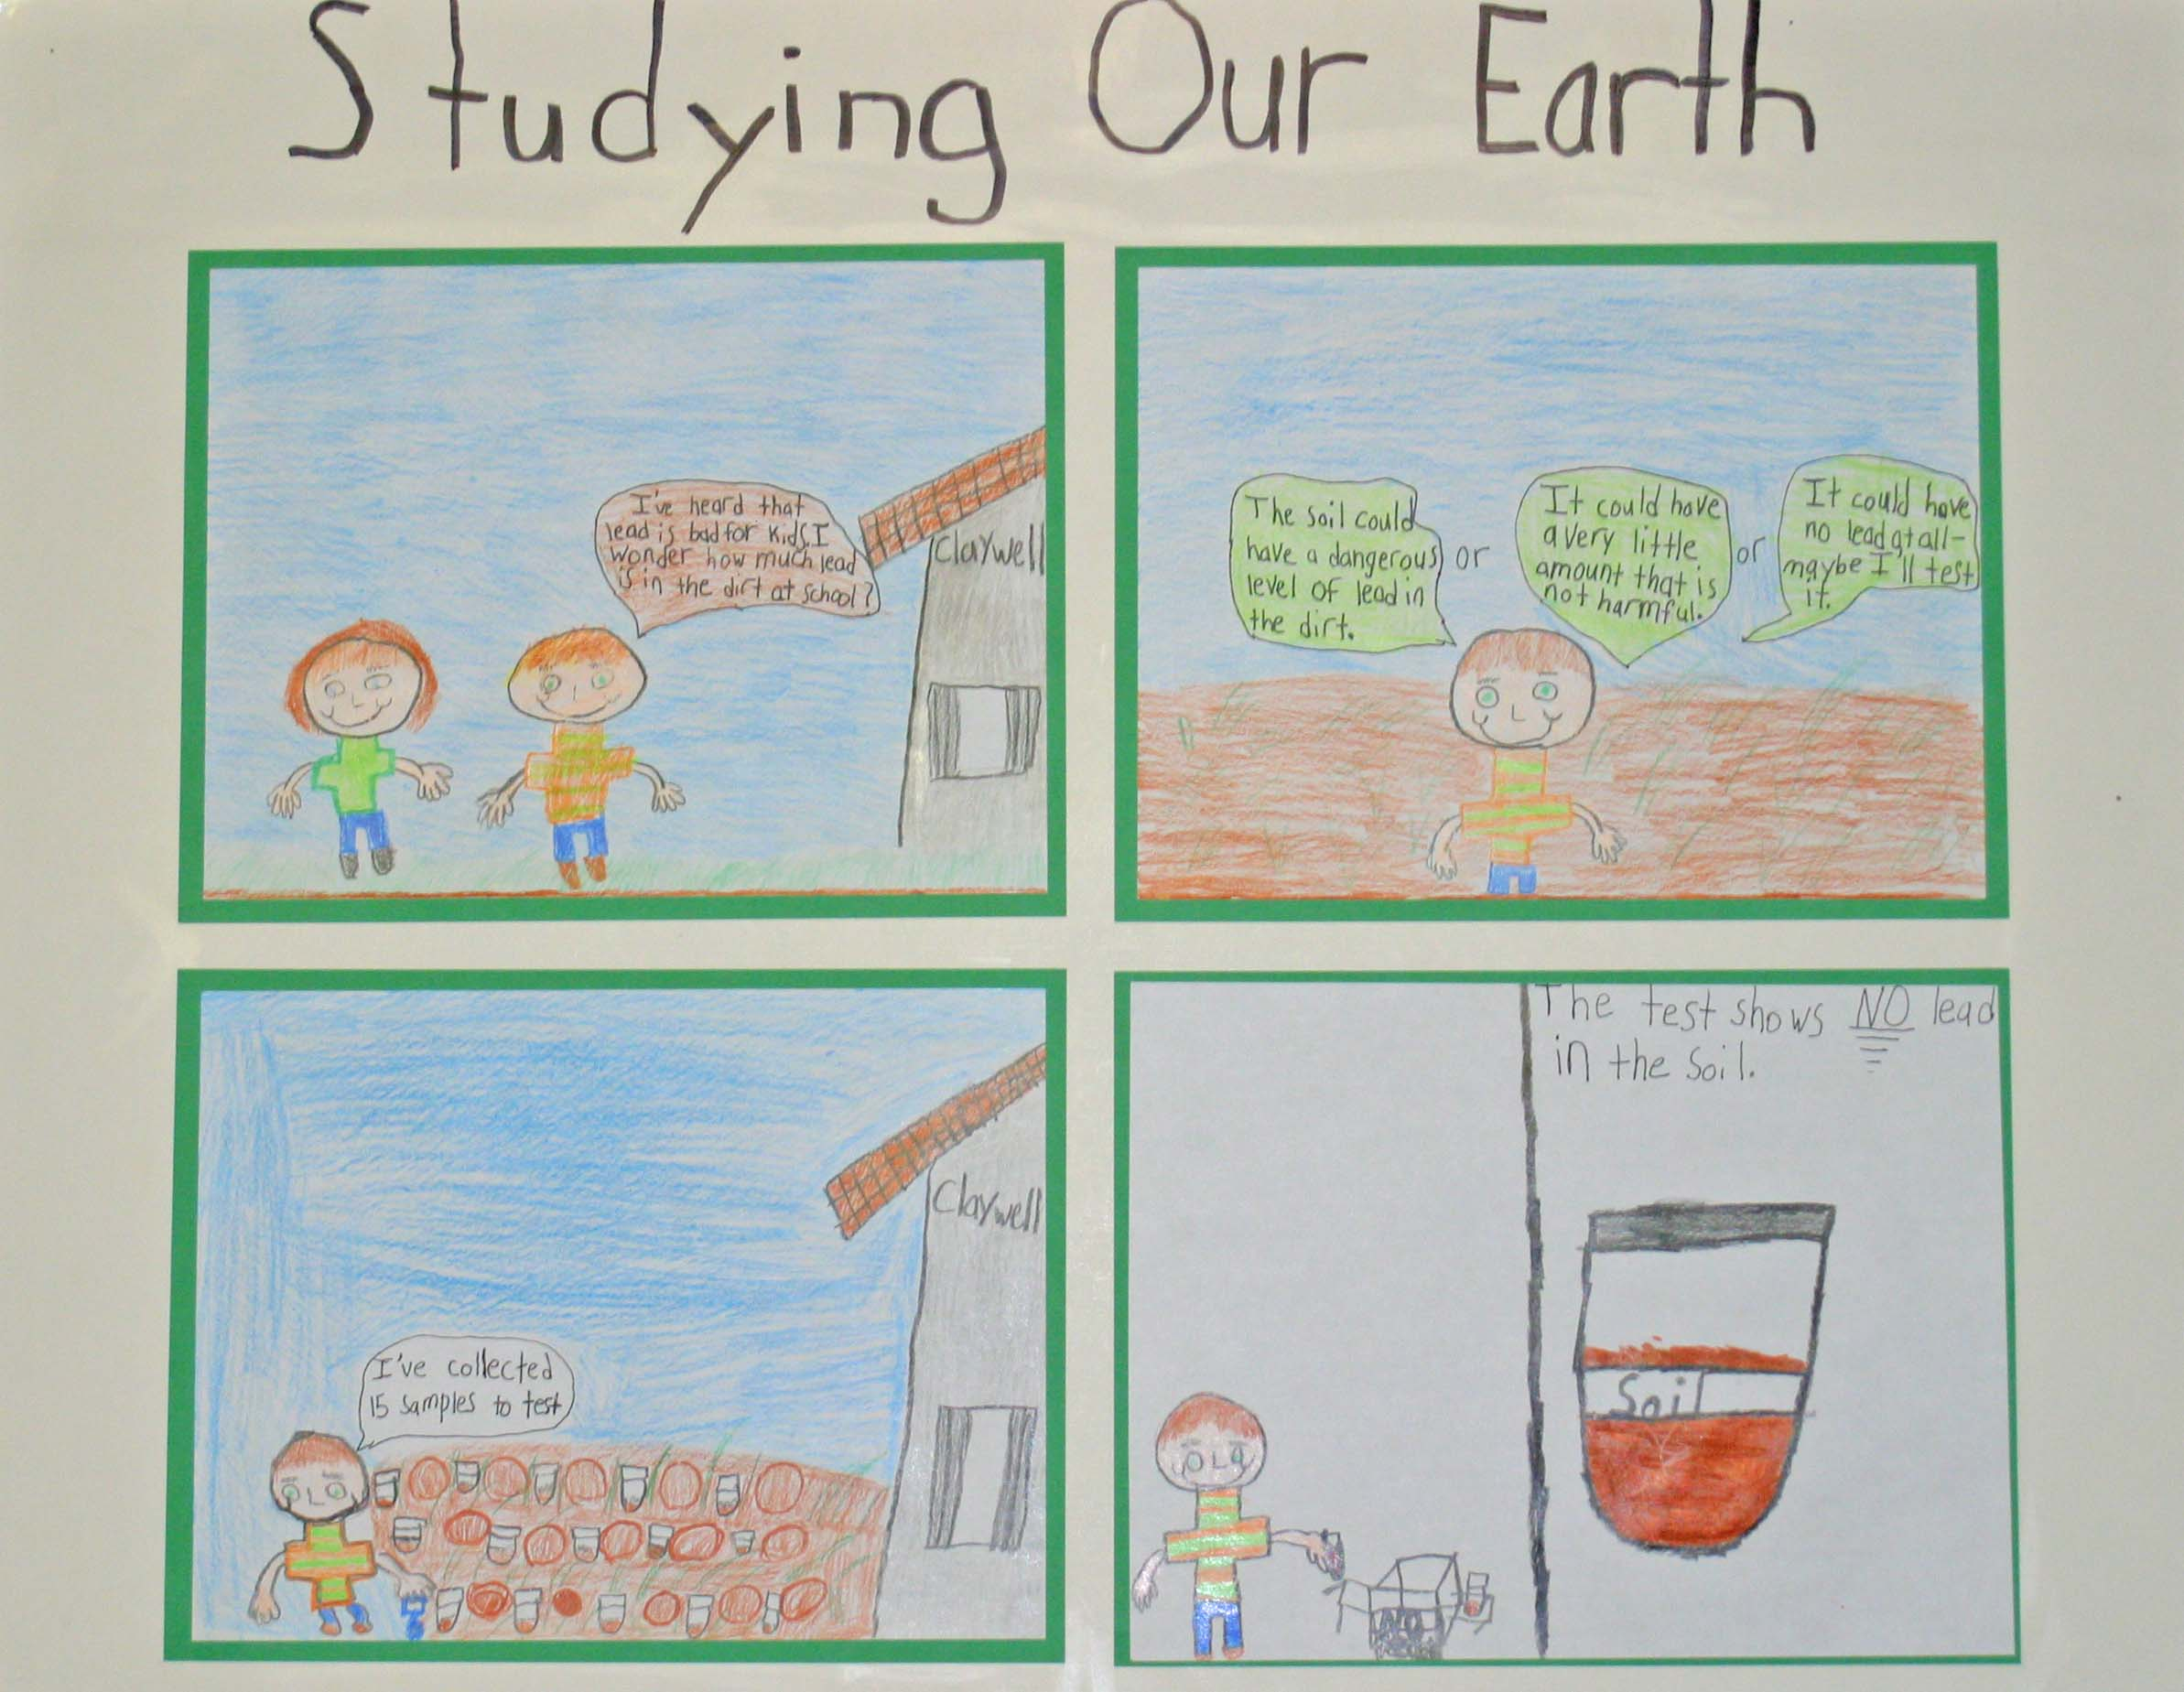 earth science week essay contest Earth science week 2012 essay contest - open to students in grades 6-9 the american geosciences institute is sponsoring an essay contest to celebrate earth science week 2012.